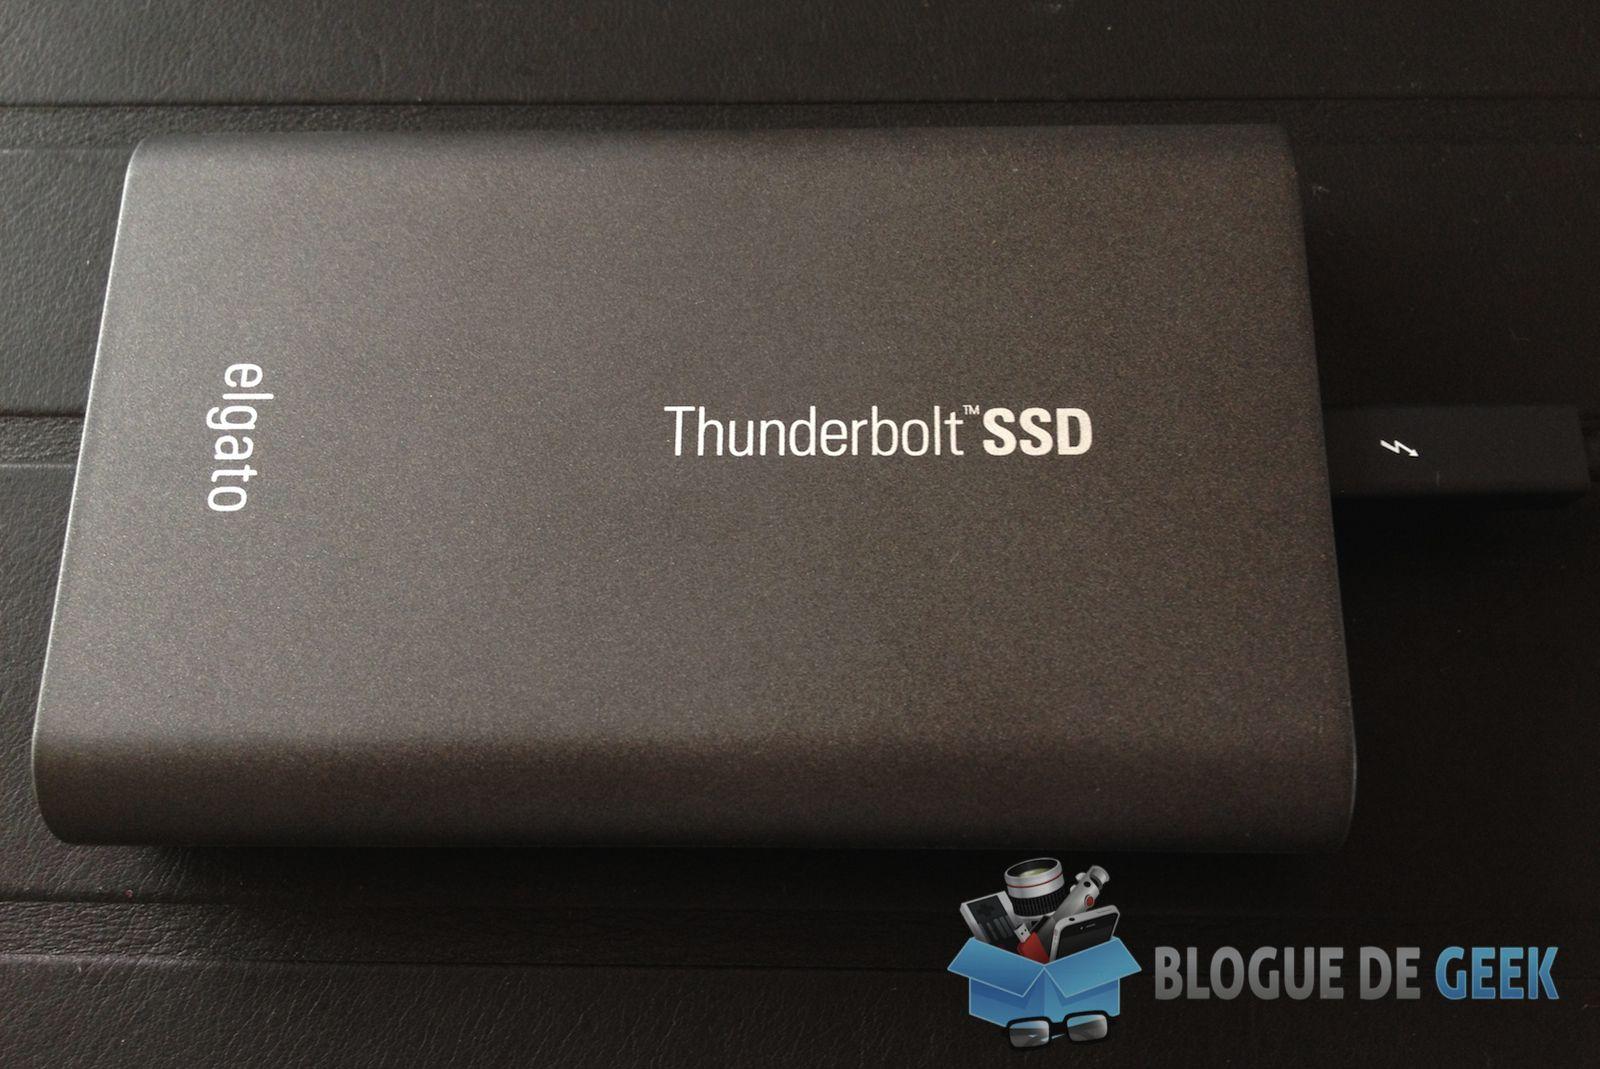 Disque Externe Elgato Thunderbolt Ssd 120go Test